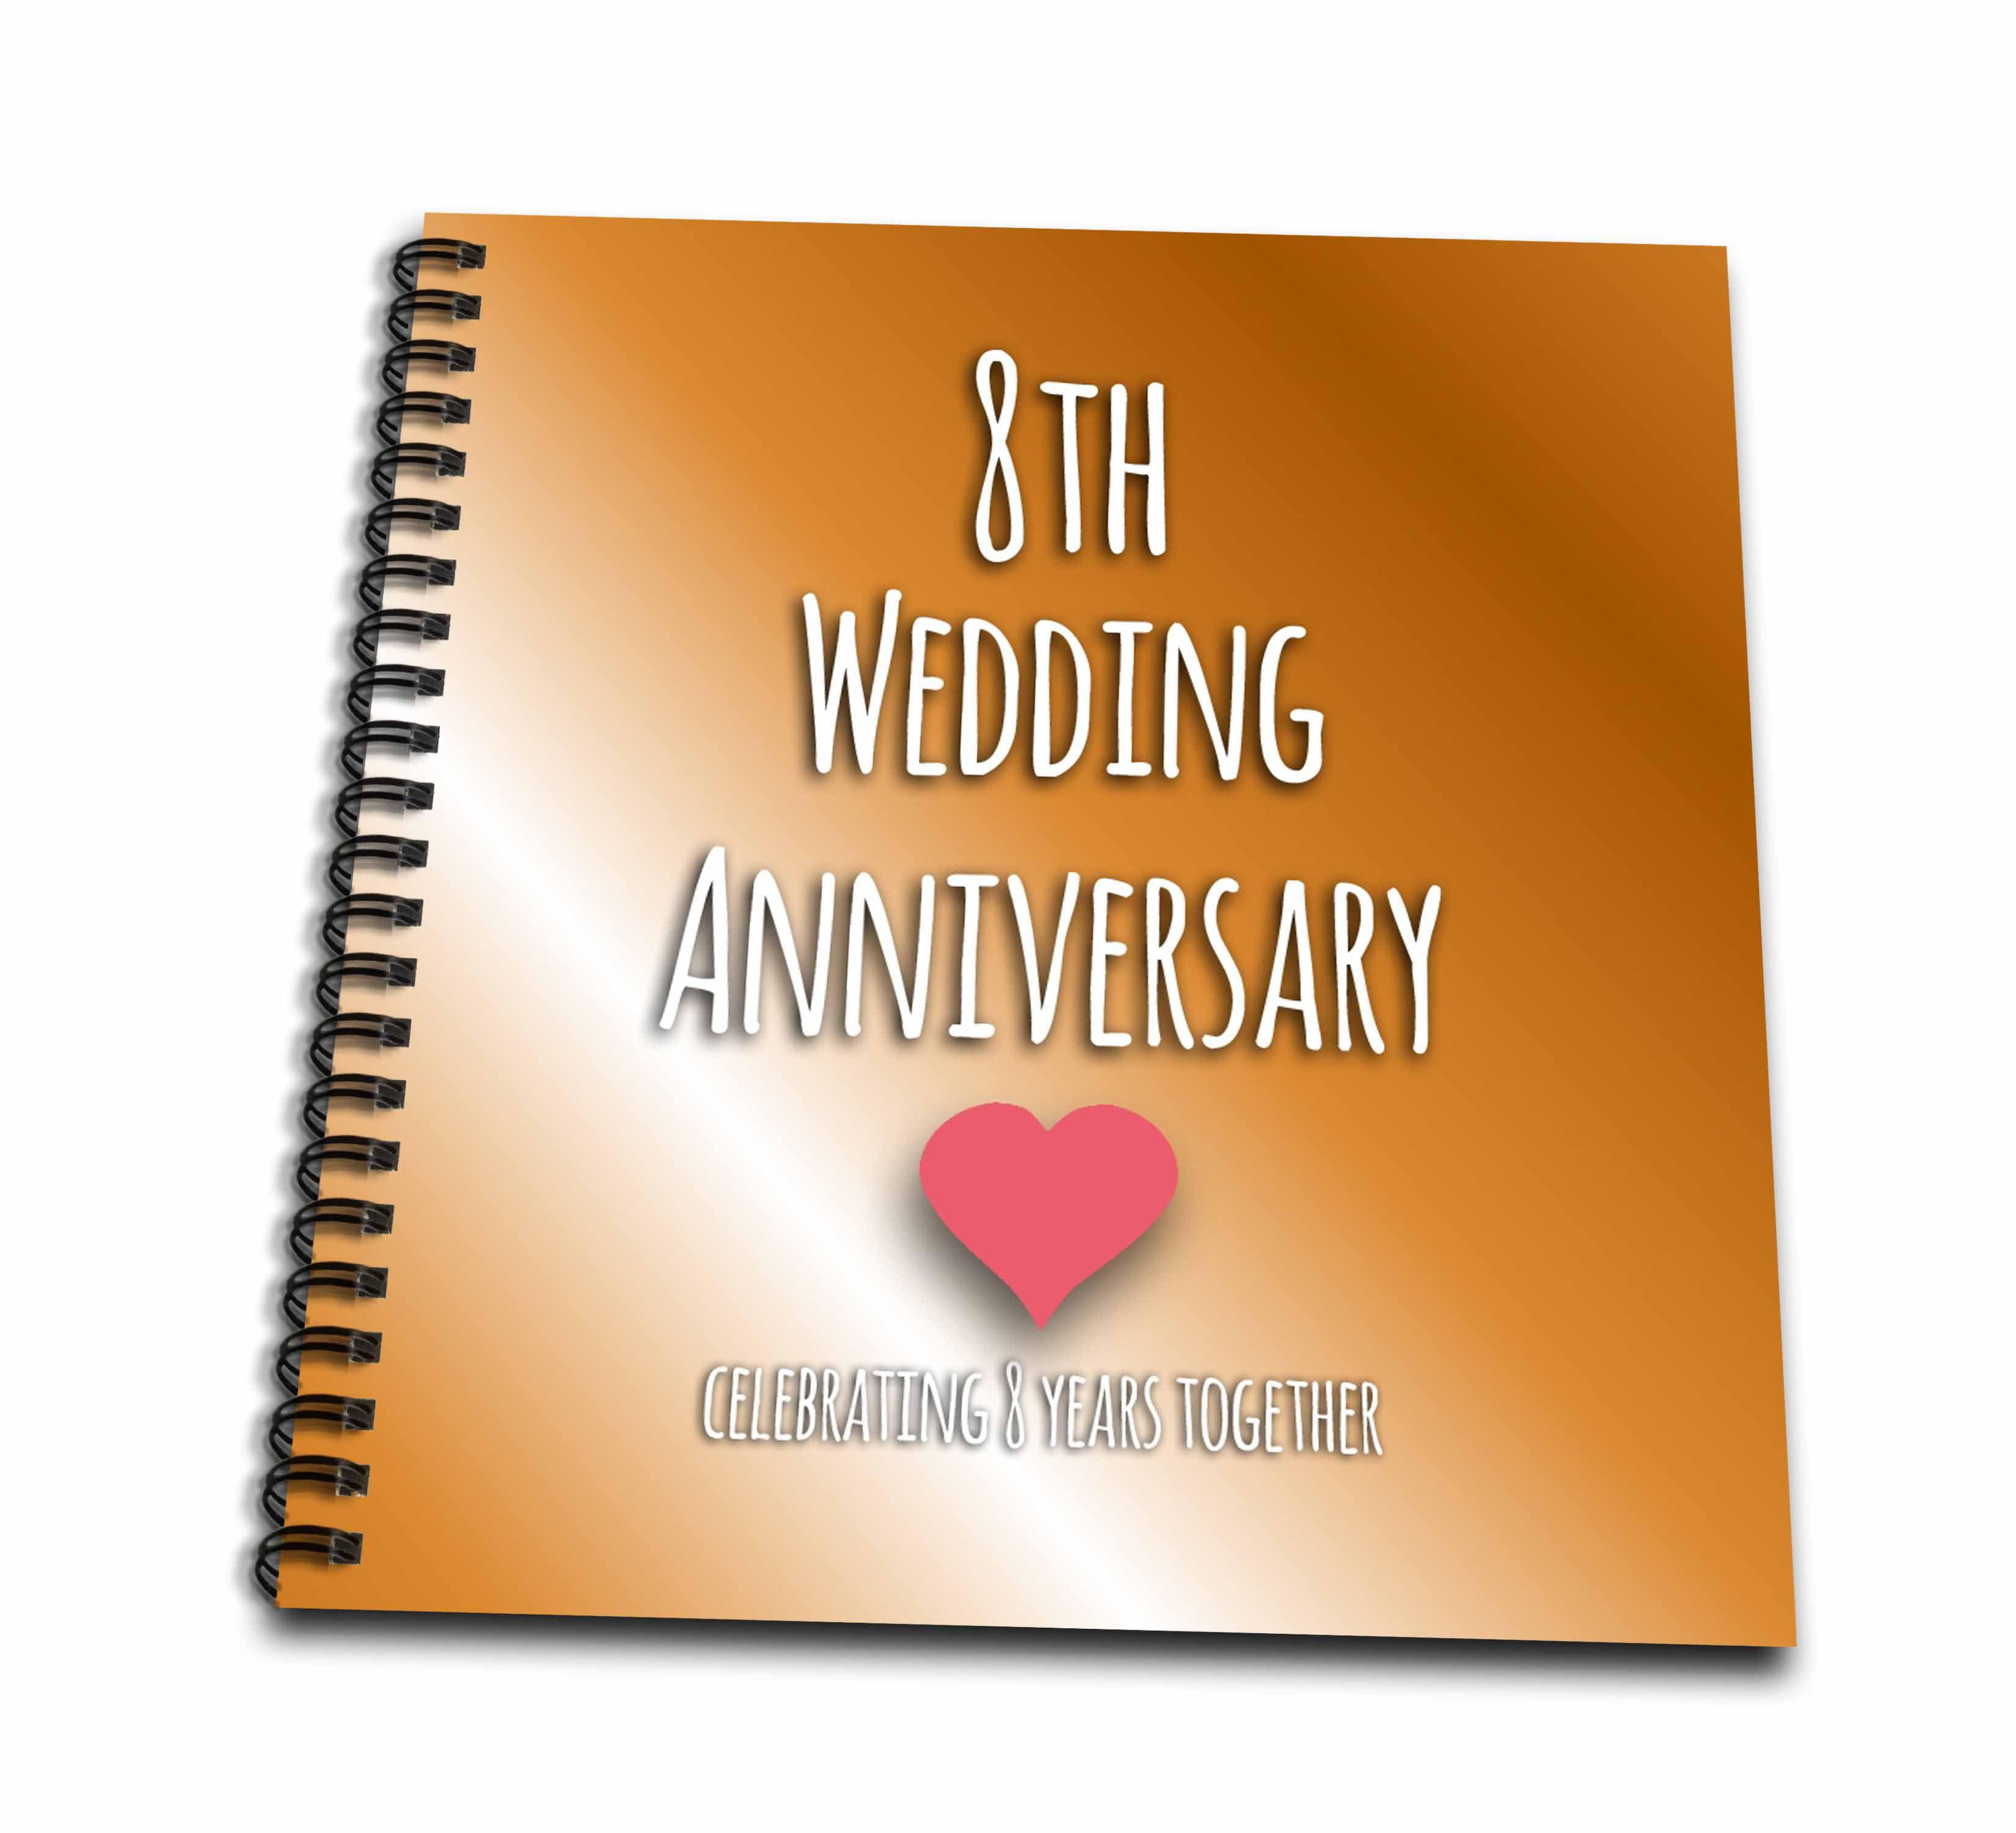 3drose 8th Wedding Anniversary Gift Bronze Celebrating 8 Years Together Eighth Anniversaries Eight Yrs Memory Book 12 By 12 Inch Walmart Com Walmart Com